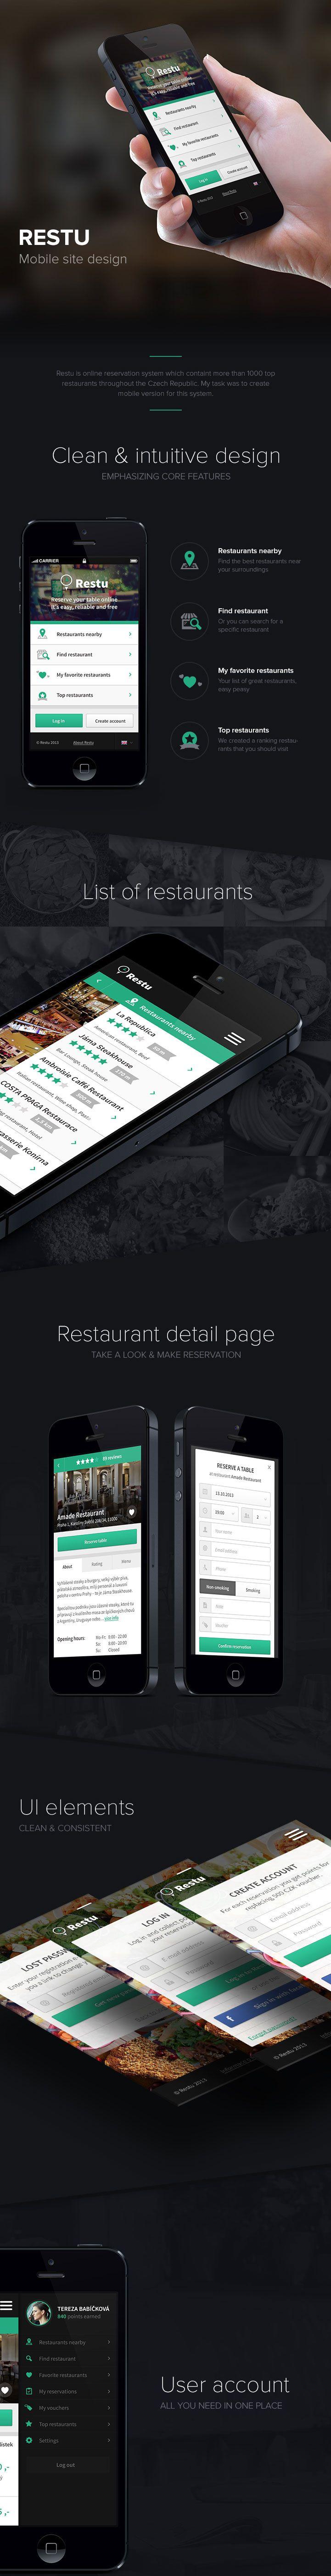 Restu mobile site